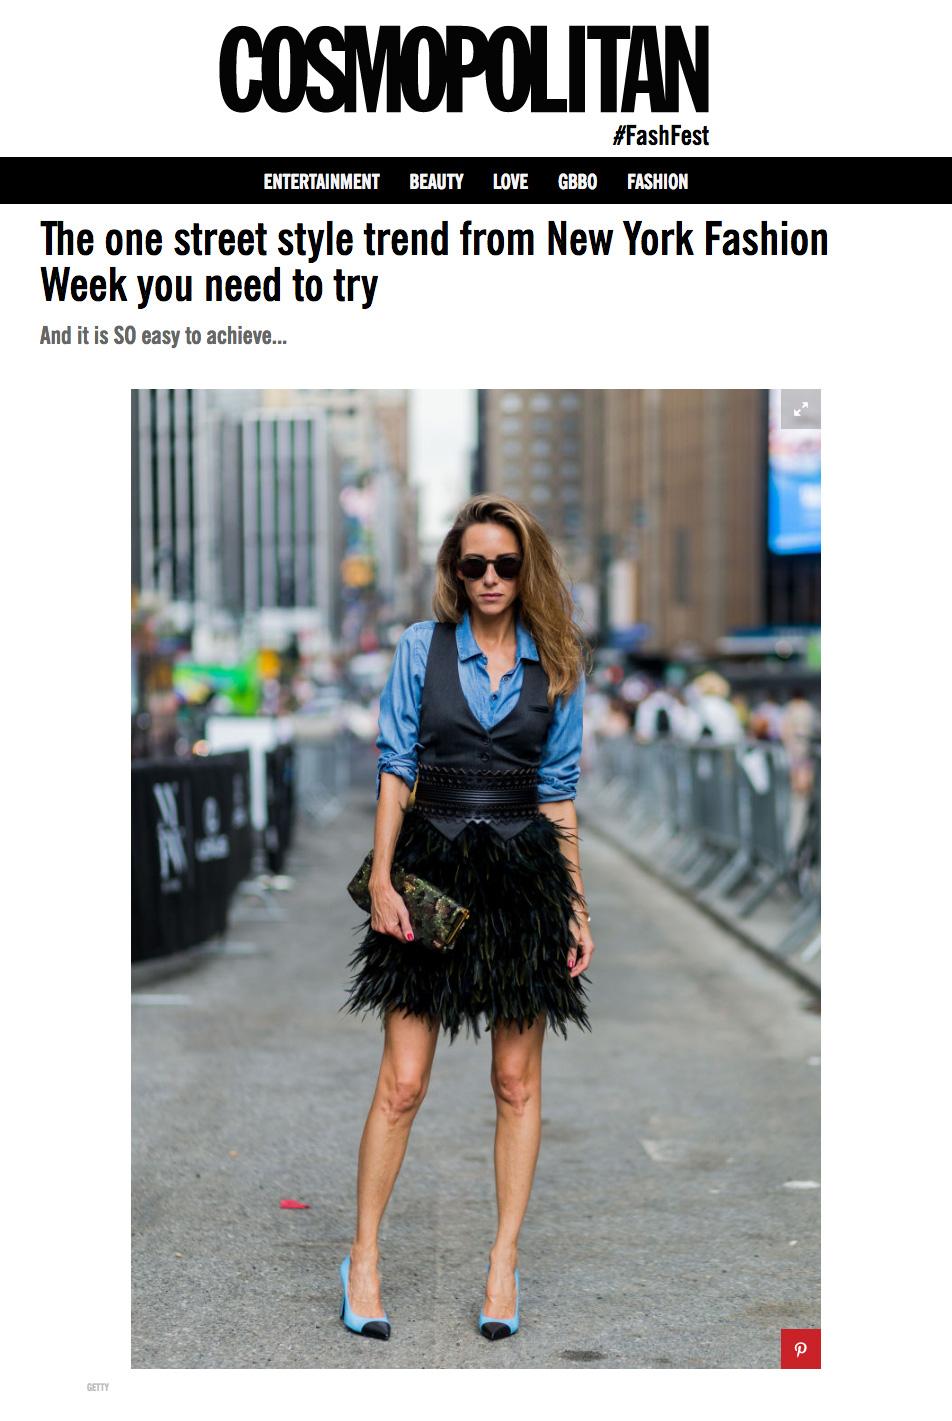 Alexandra Lapp Street Style at New York Fashion Week 2016 - Photo by Christian Vierig - Found on www.cosmopolitan.co.uk